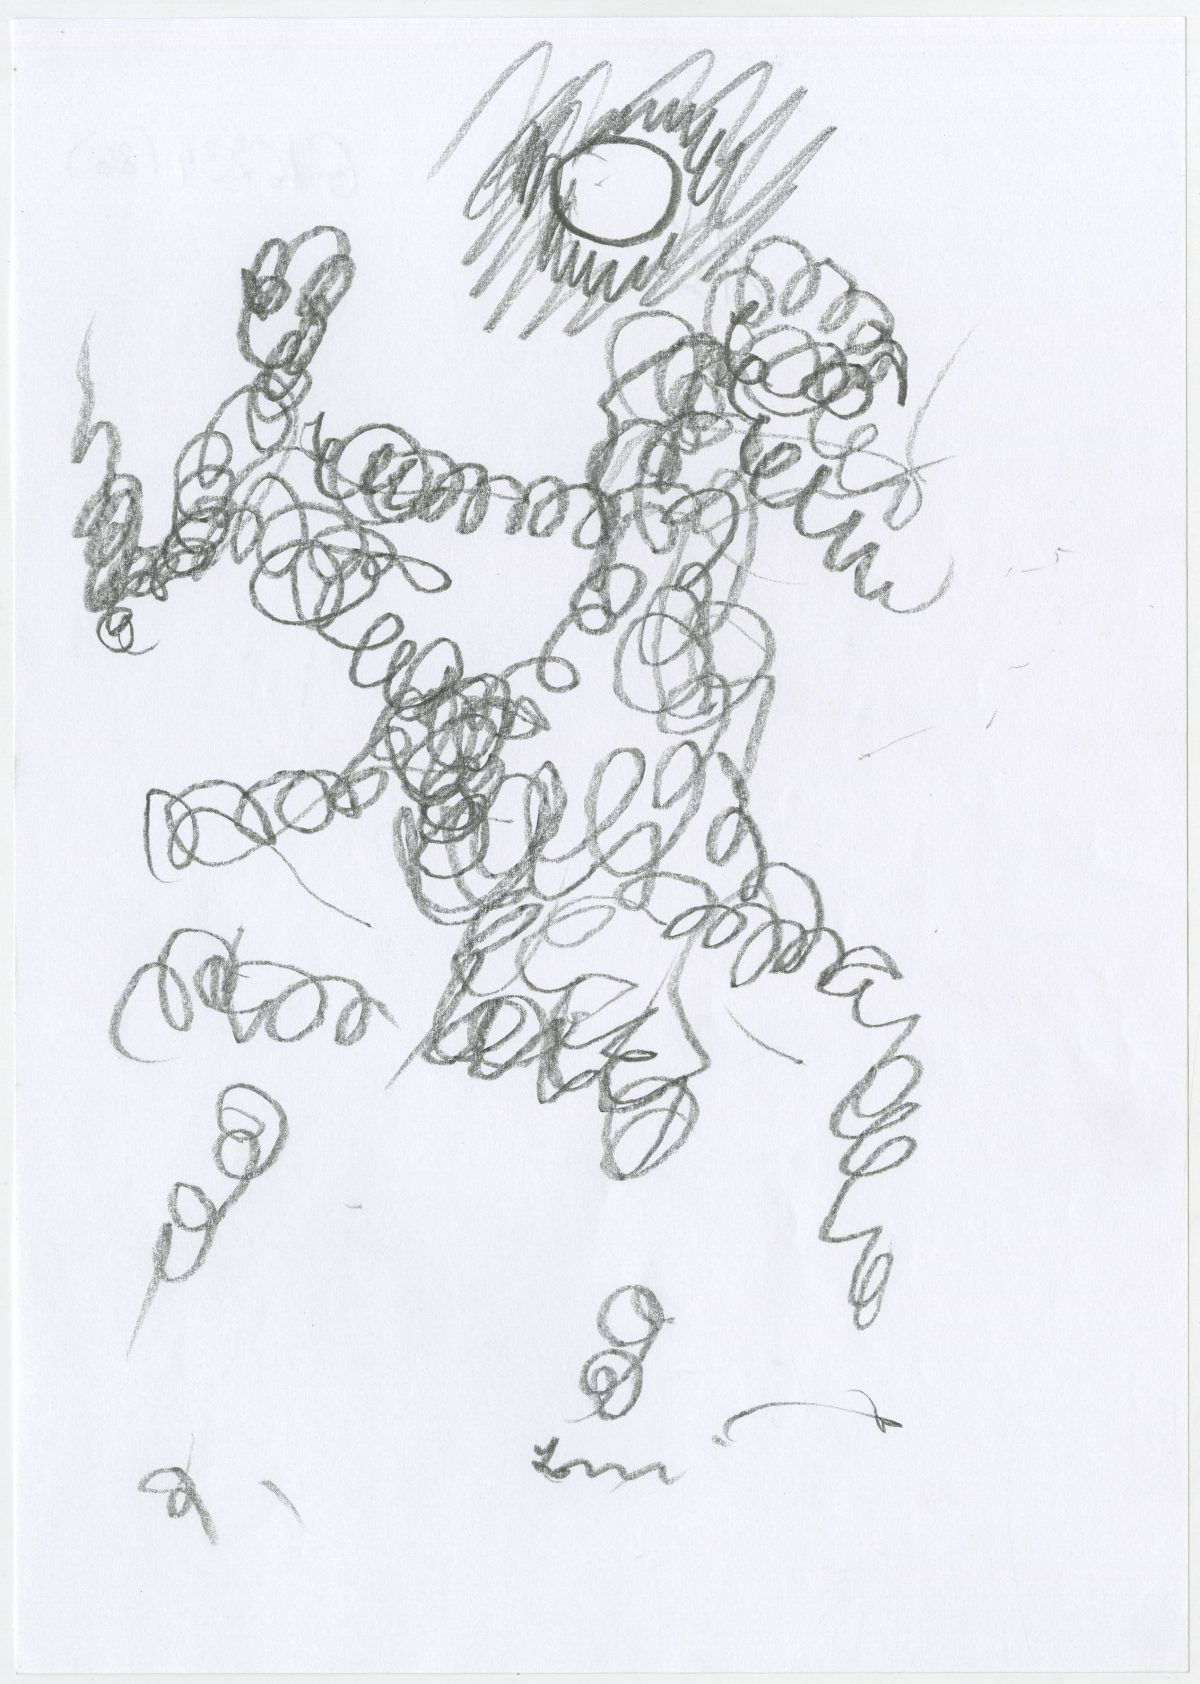 G16234(86)<br/> <b>Cím:</b> Ez is van, az is van, csak … <br/> <b>Méret cm:</b> 29,7x21 <br/> <b>Készült:</b> 2005. <br/> <b>Technika:</b> ceruza<br/>